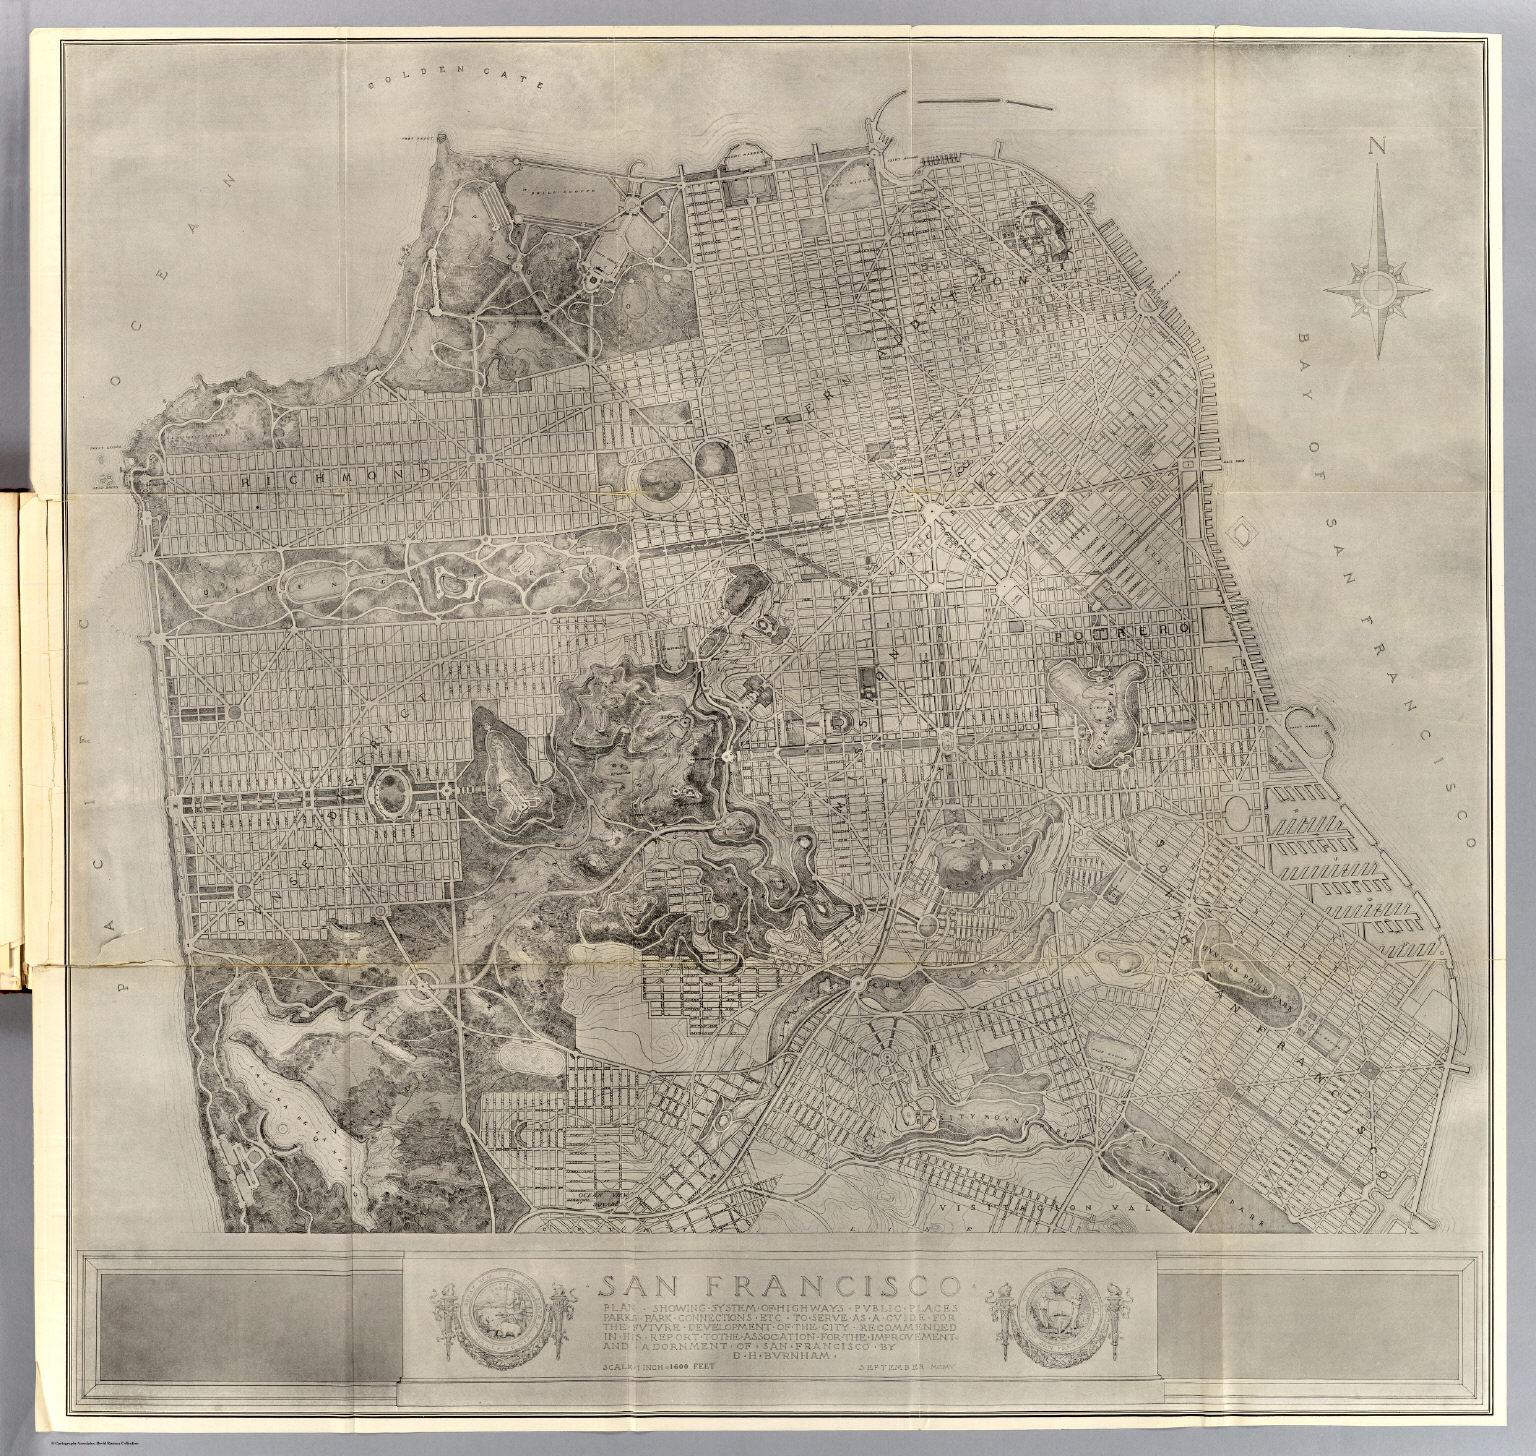 San Francisco plan. - David Rumsey Historical Map Collection